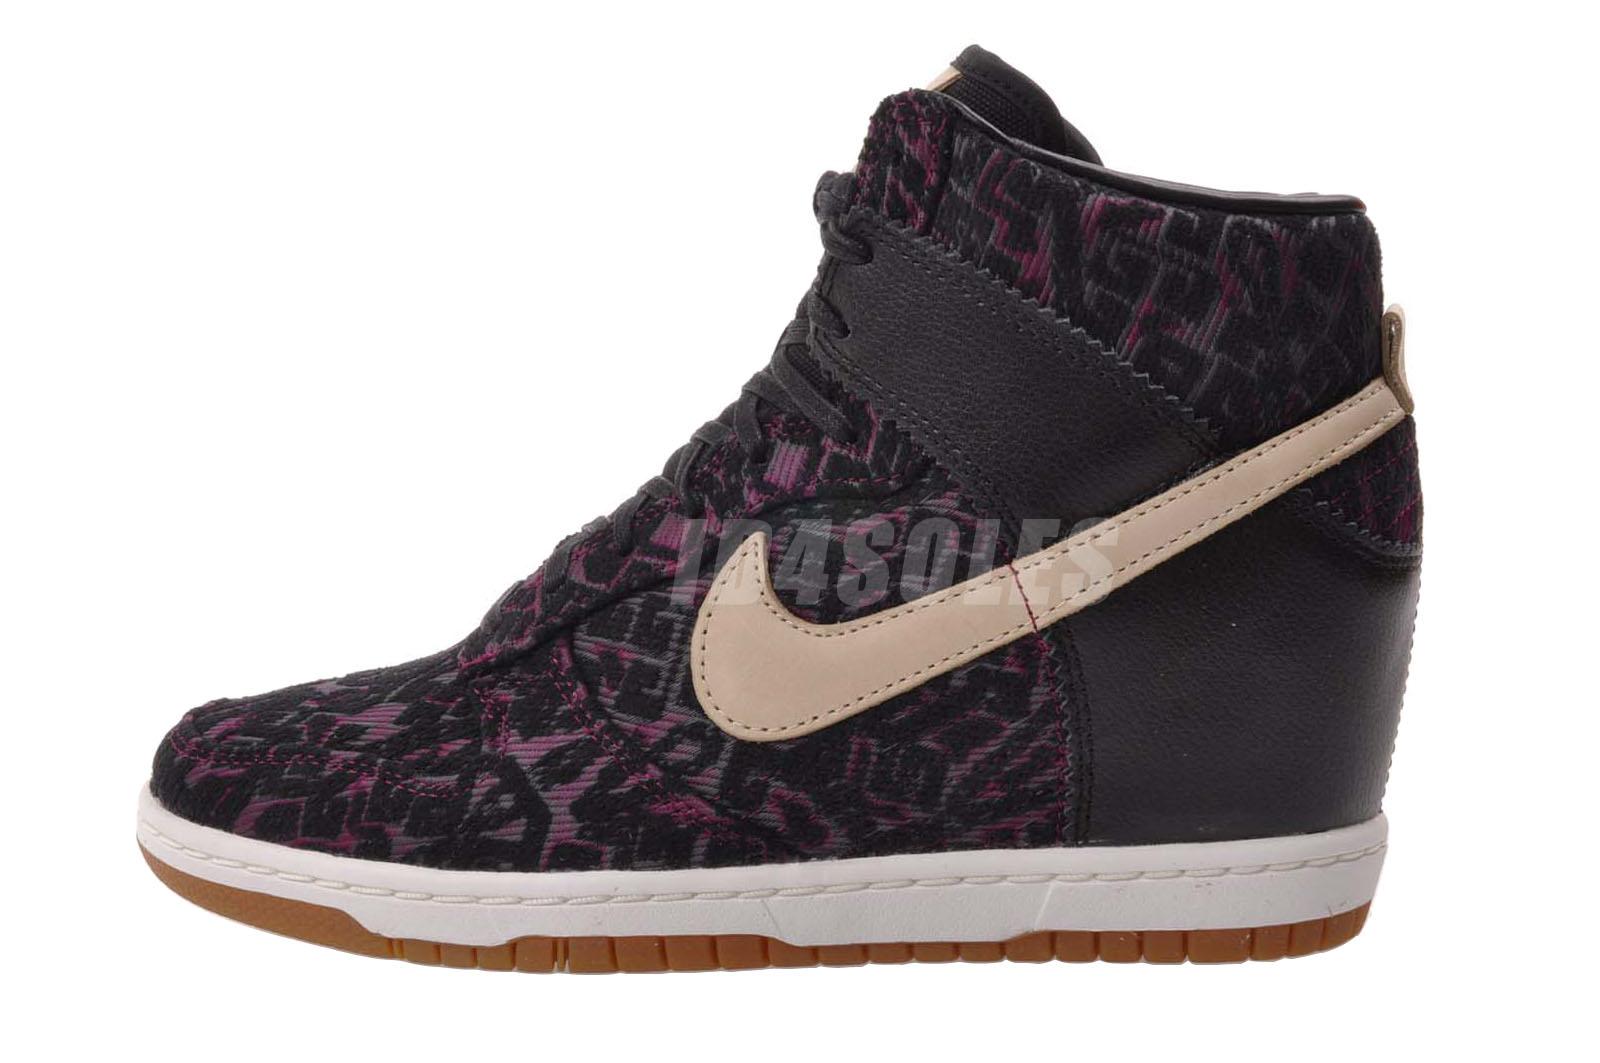 nike wmns dunk sky hi prm womens high premium casual shoes